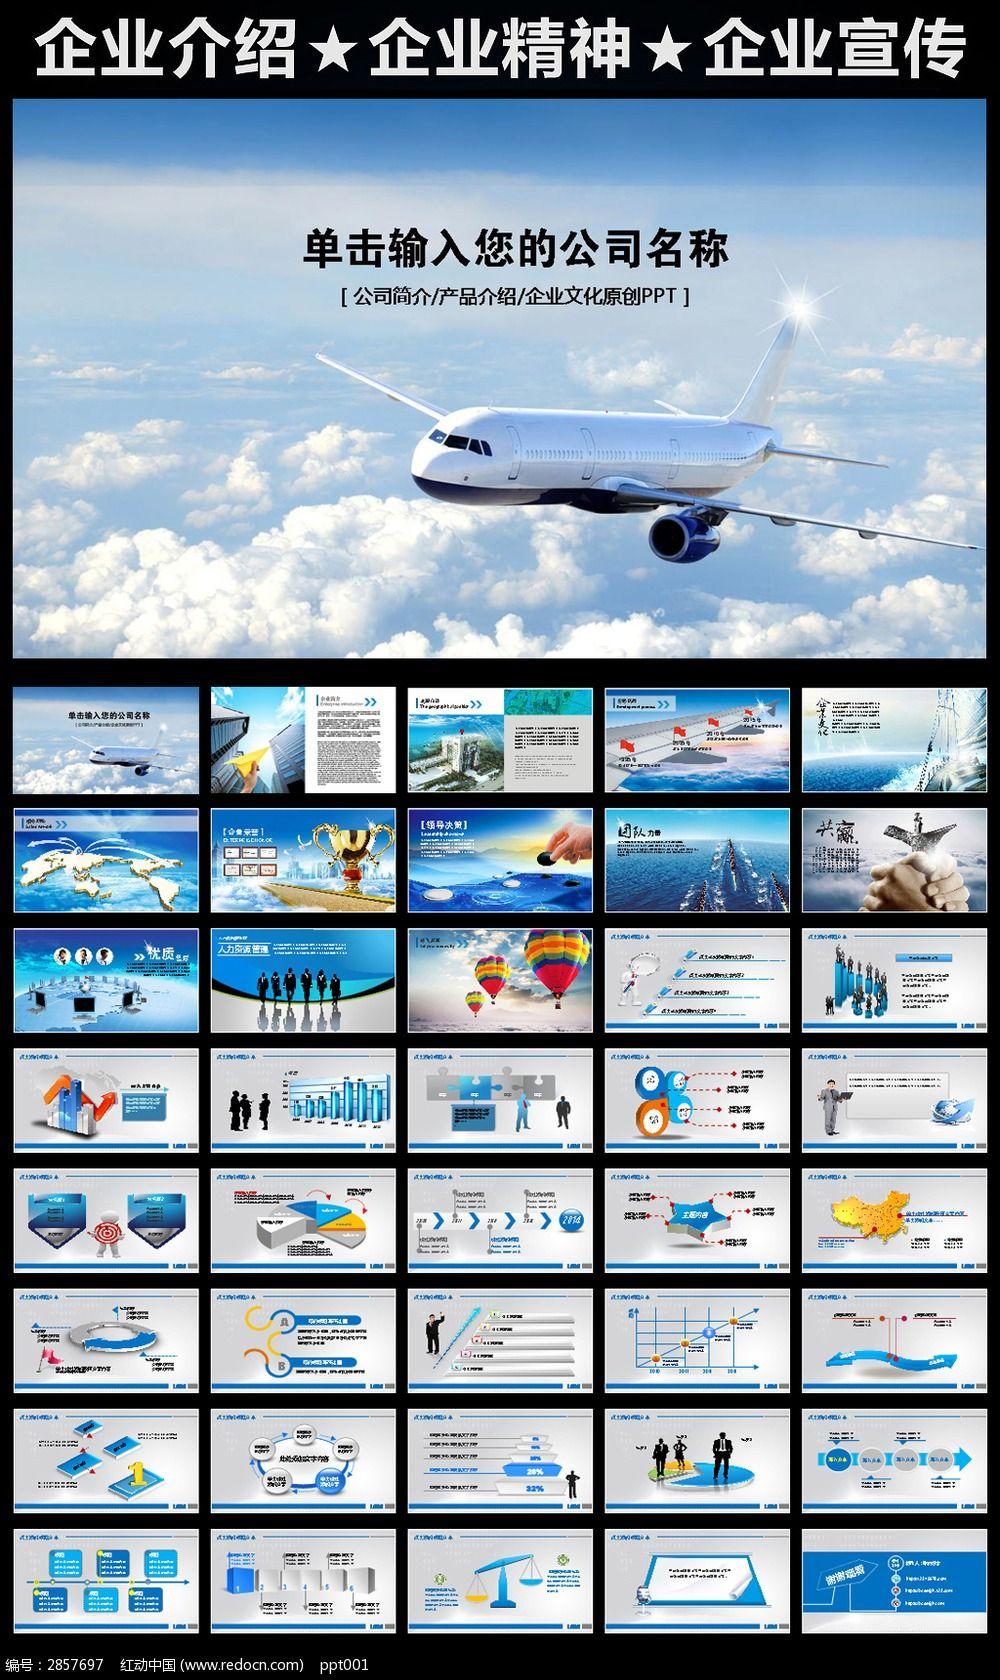 飞机介绍英语ppt